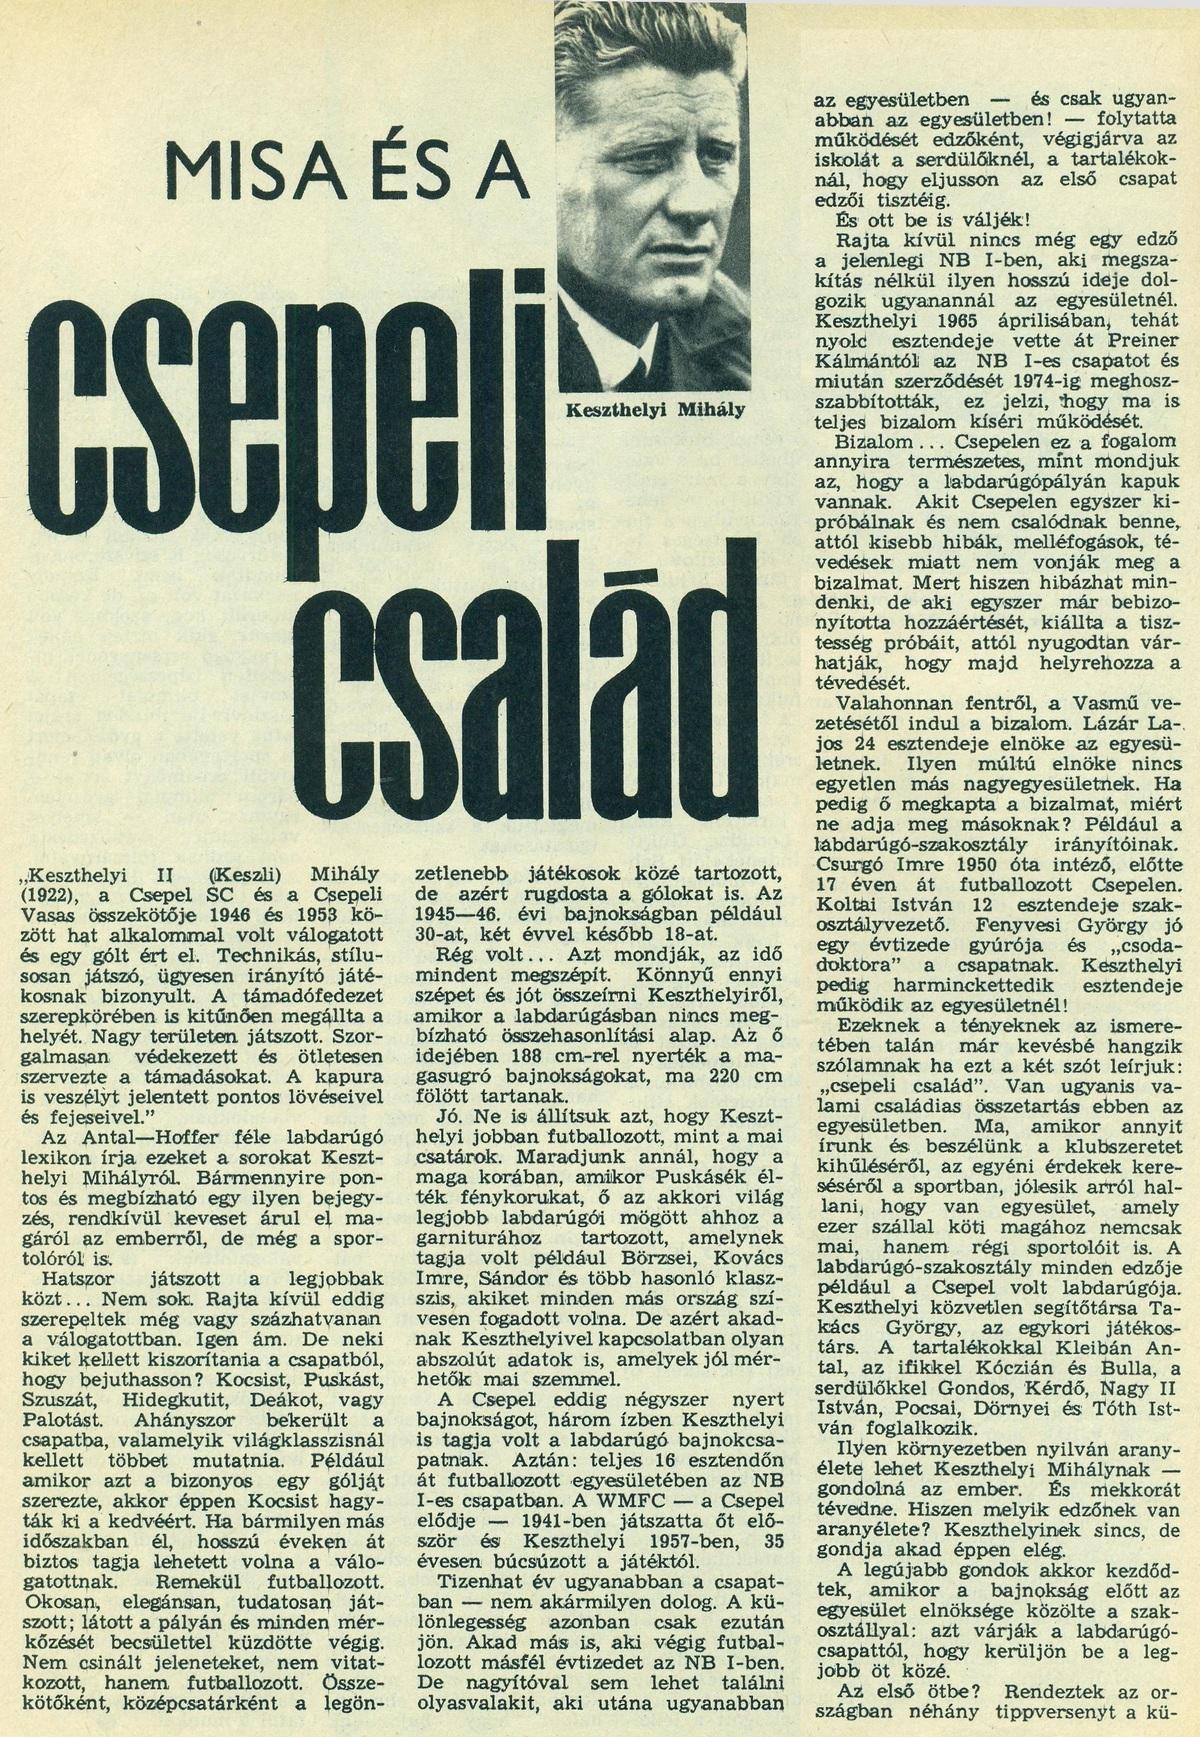 Sprtlt-1973-0012-0013